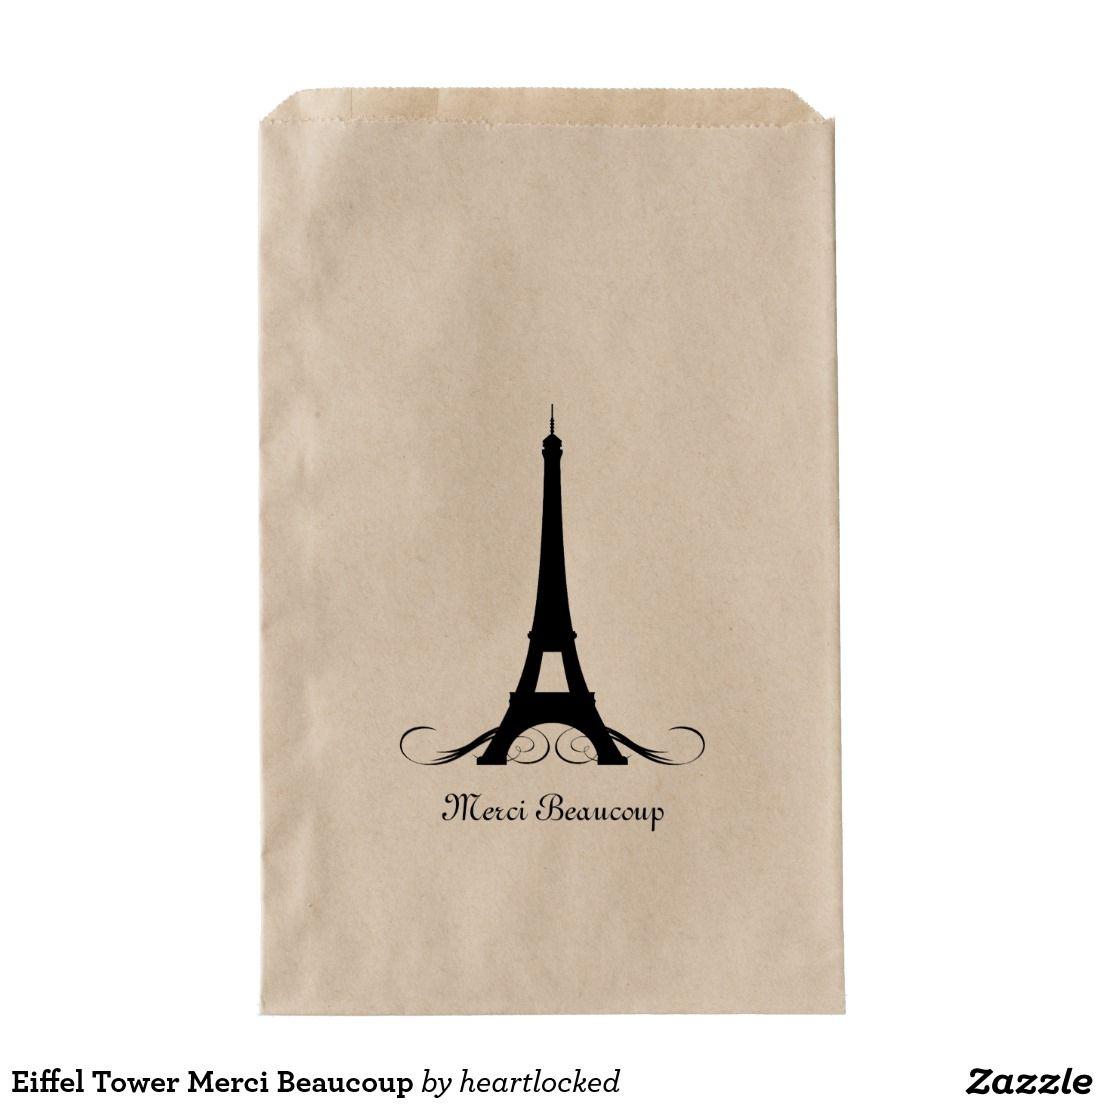 Eiffel Tower Merci Beaucoup Favor Bag | Favor bags, Favors and ...